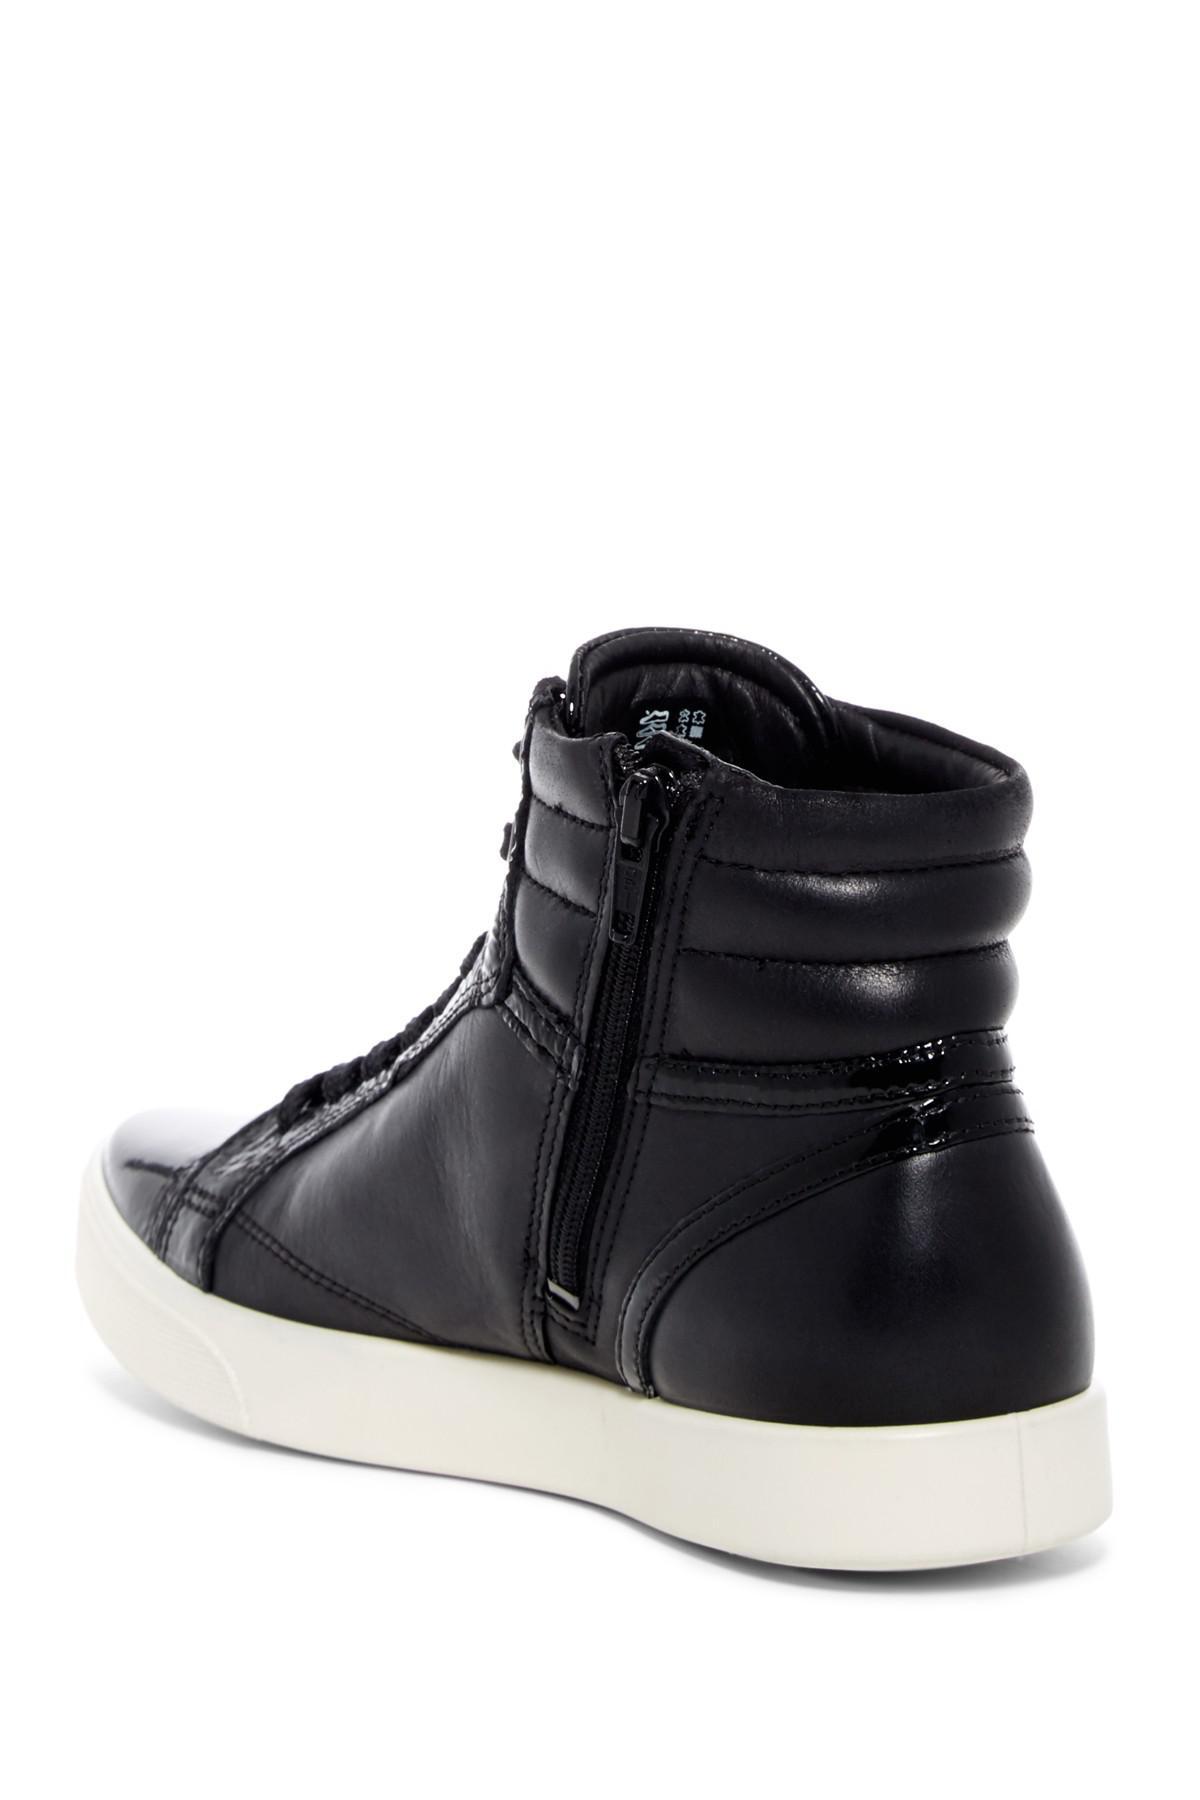 Ecco Gillian High-top Leather Sneaker